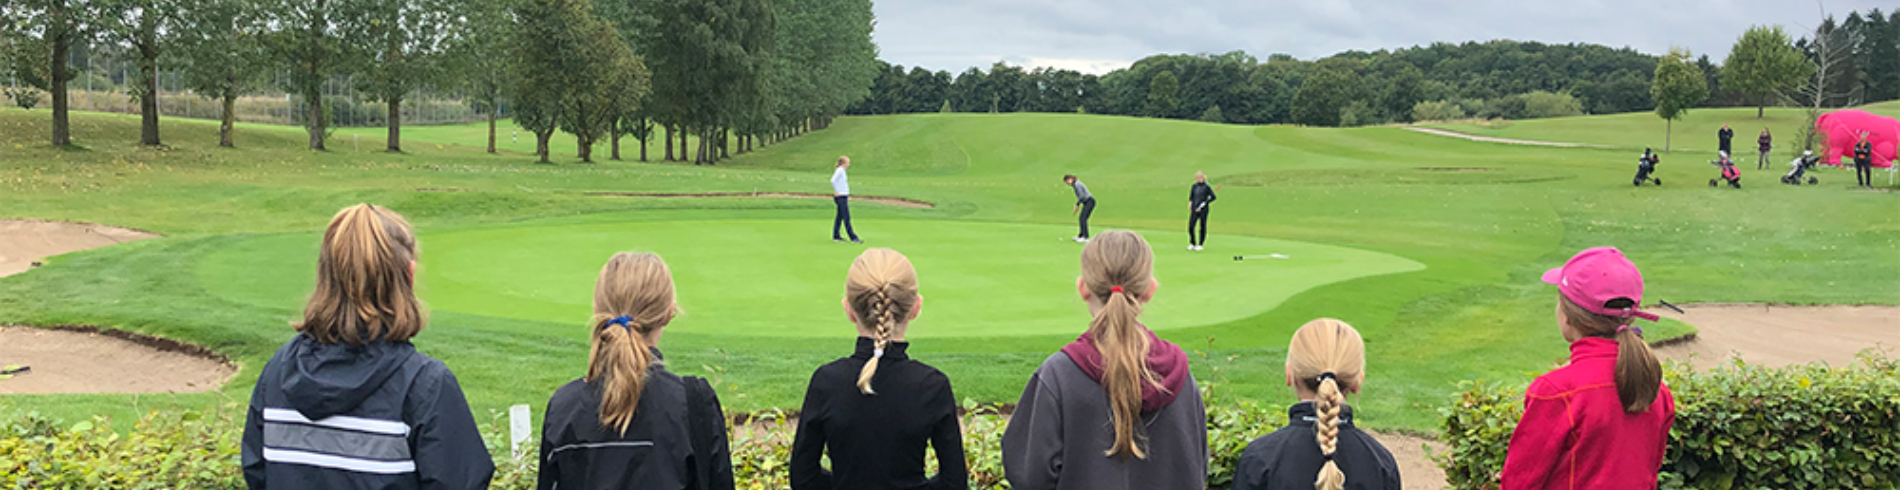 Dansk Golf Union cover image